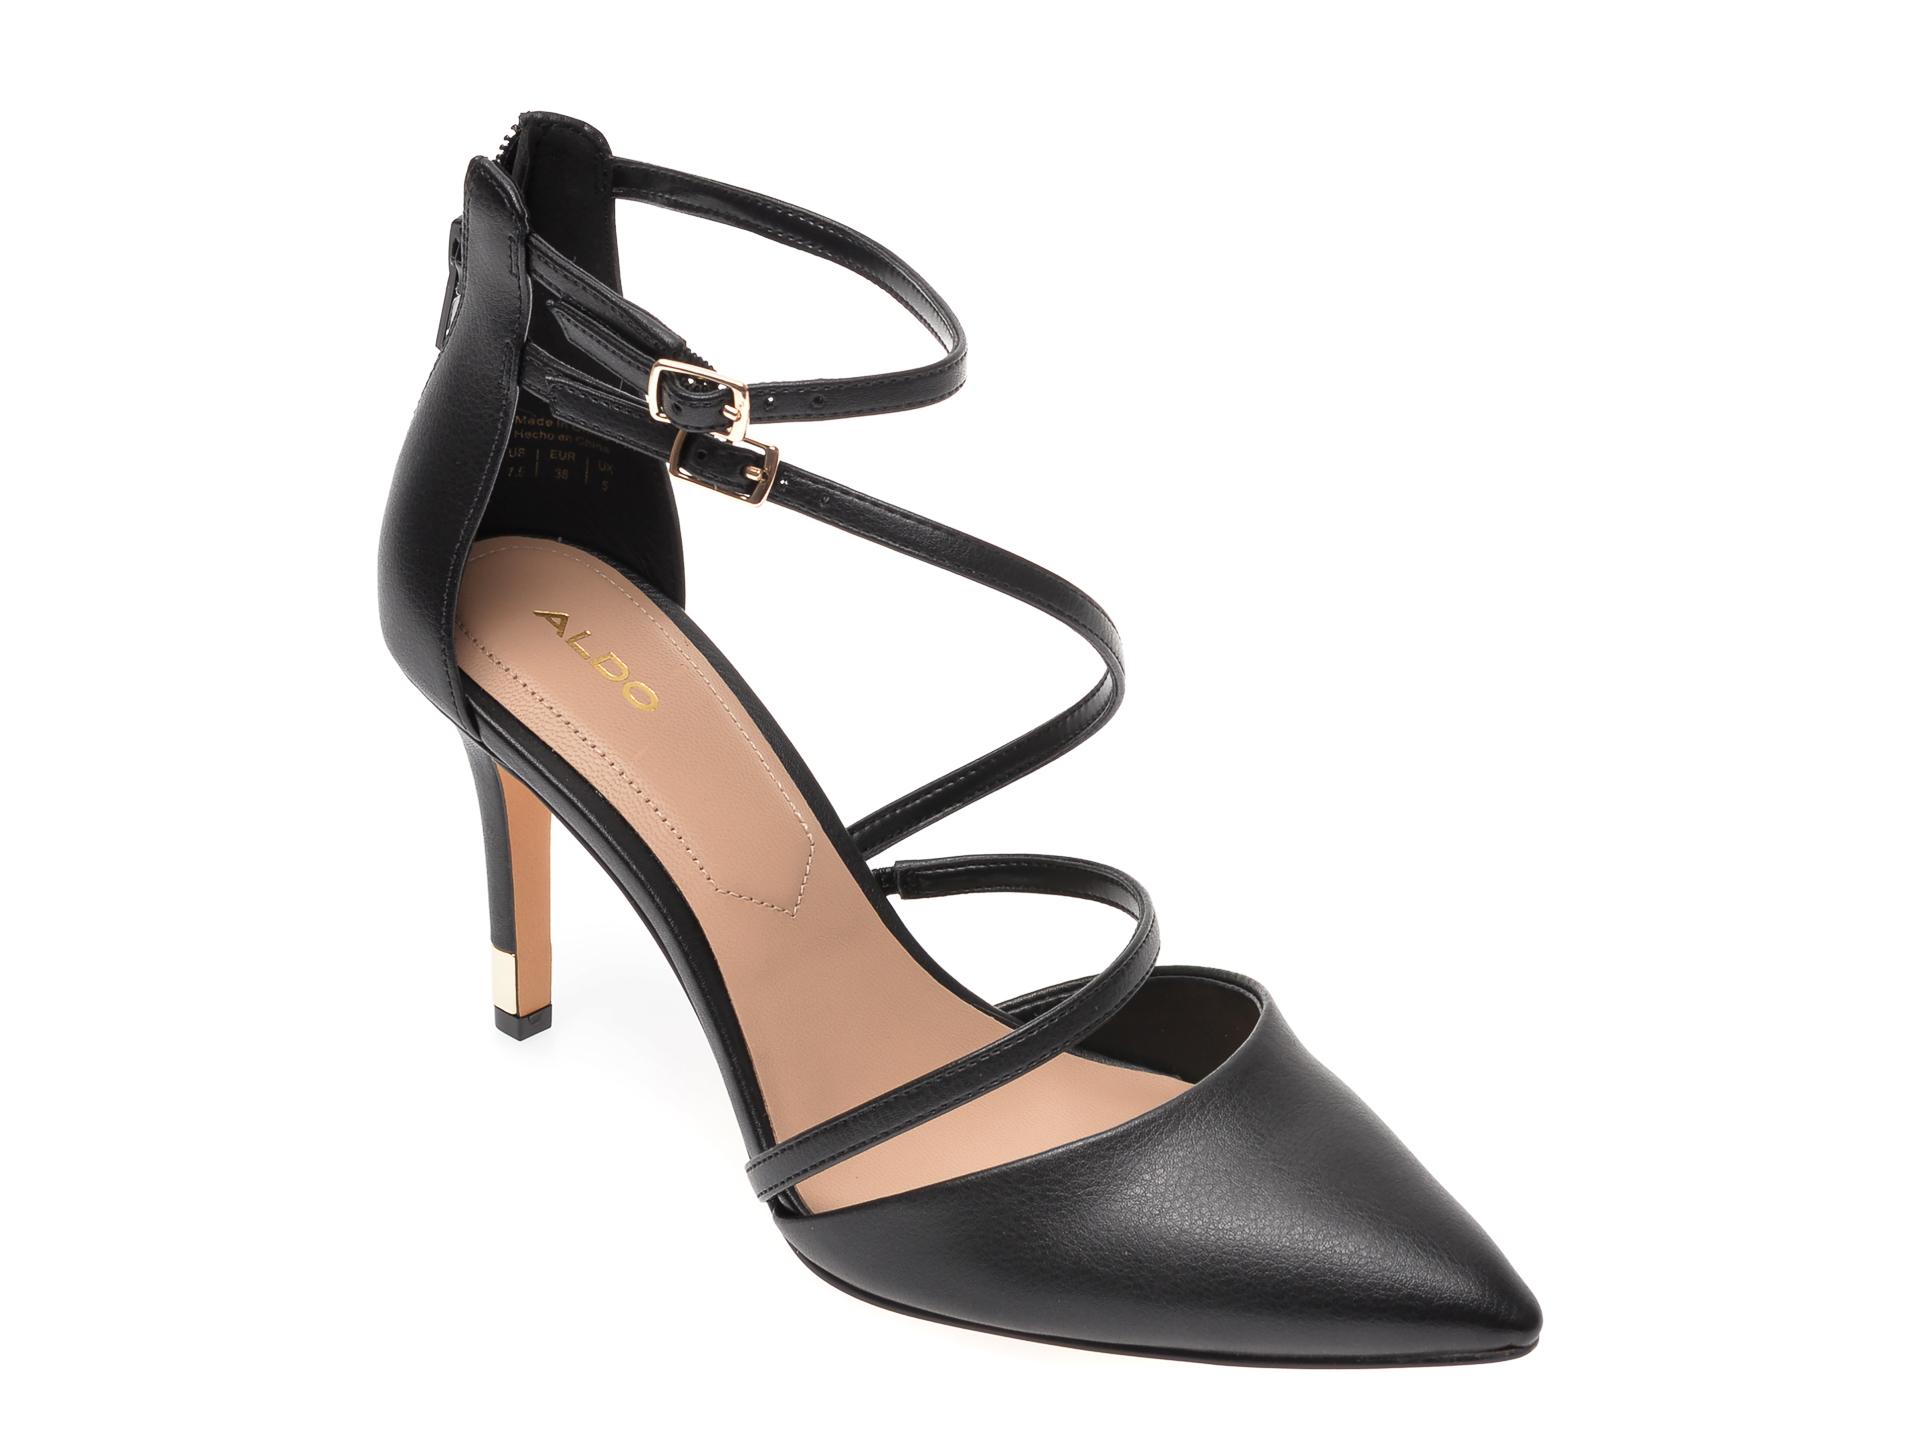 Pantofi ALDO negri, Torga001, din piele ecologica imagine otter.ro 2021